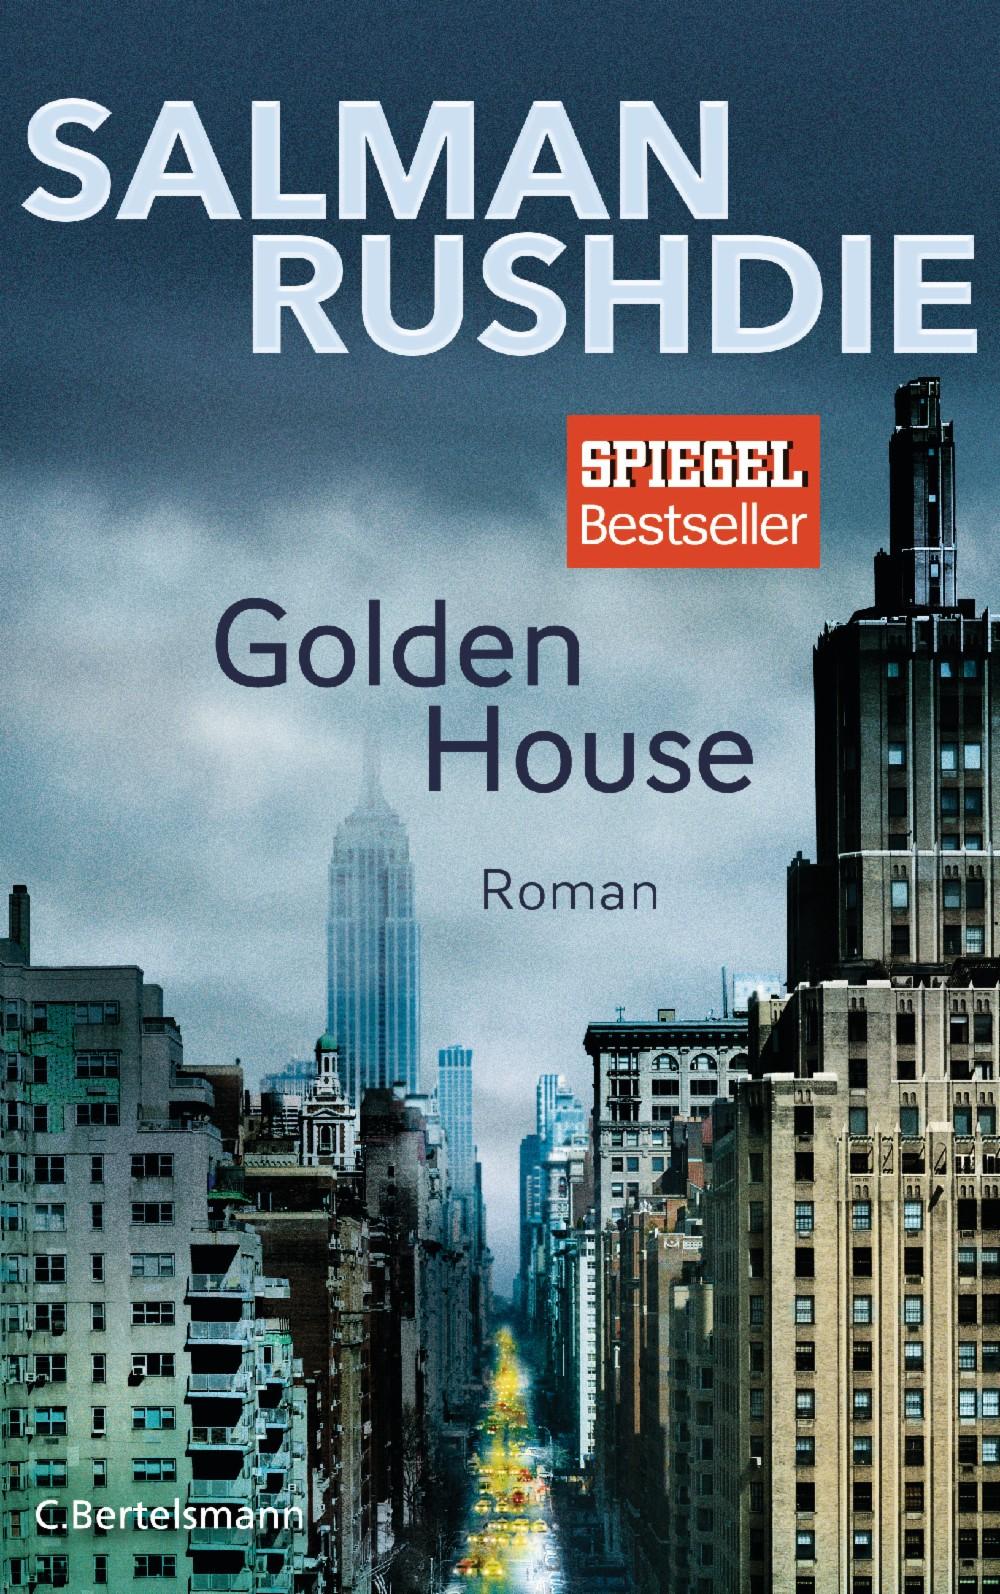 Salman Rushdie, Golden House